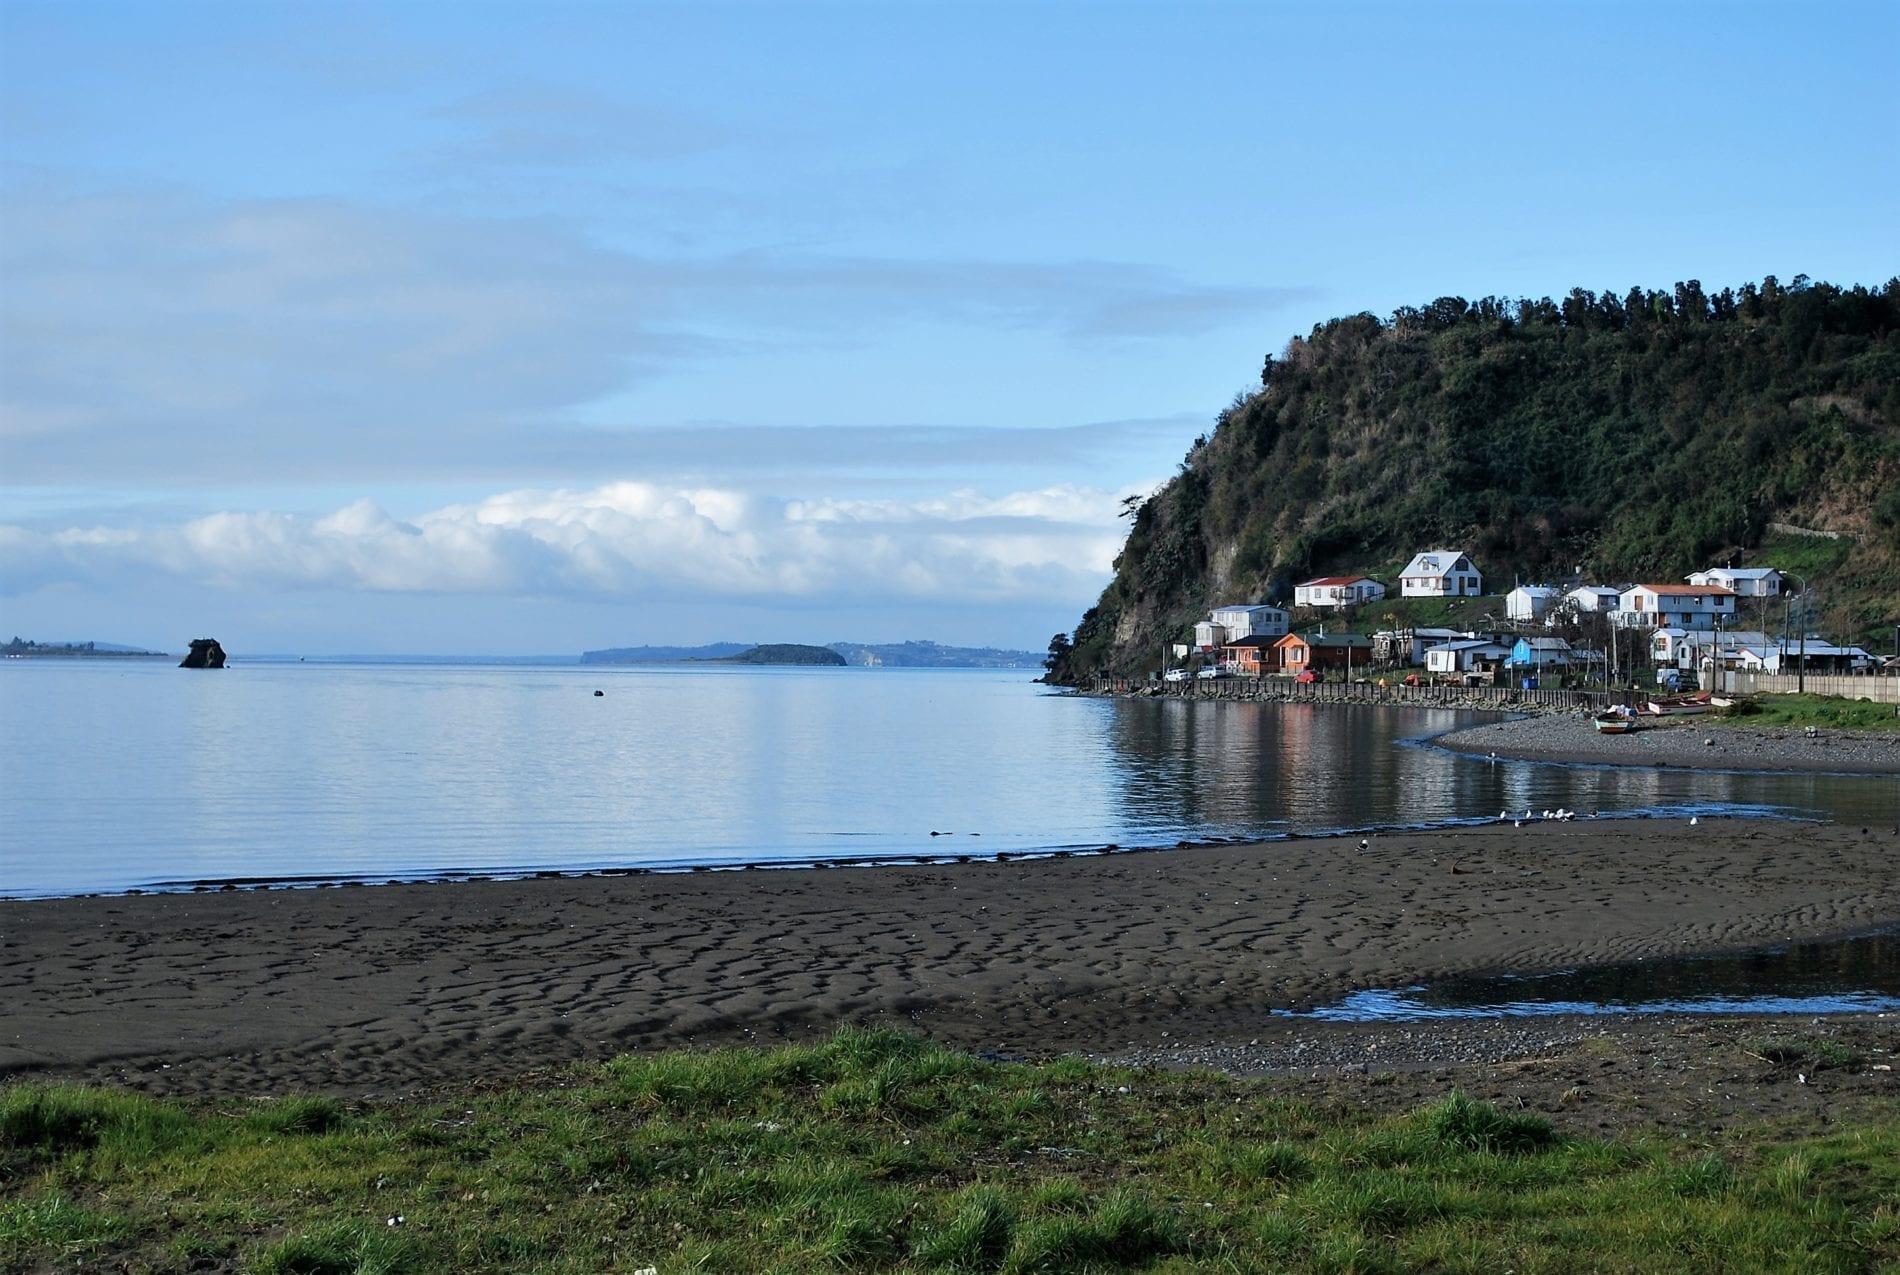 Chiloe, Chile, Likechile